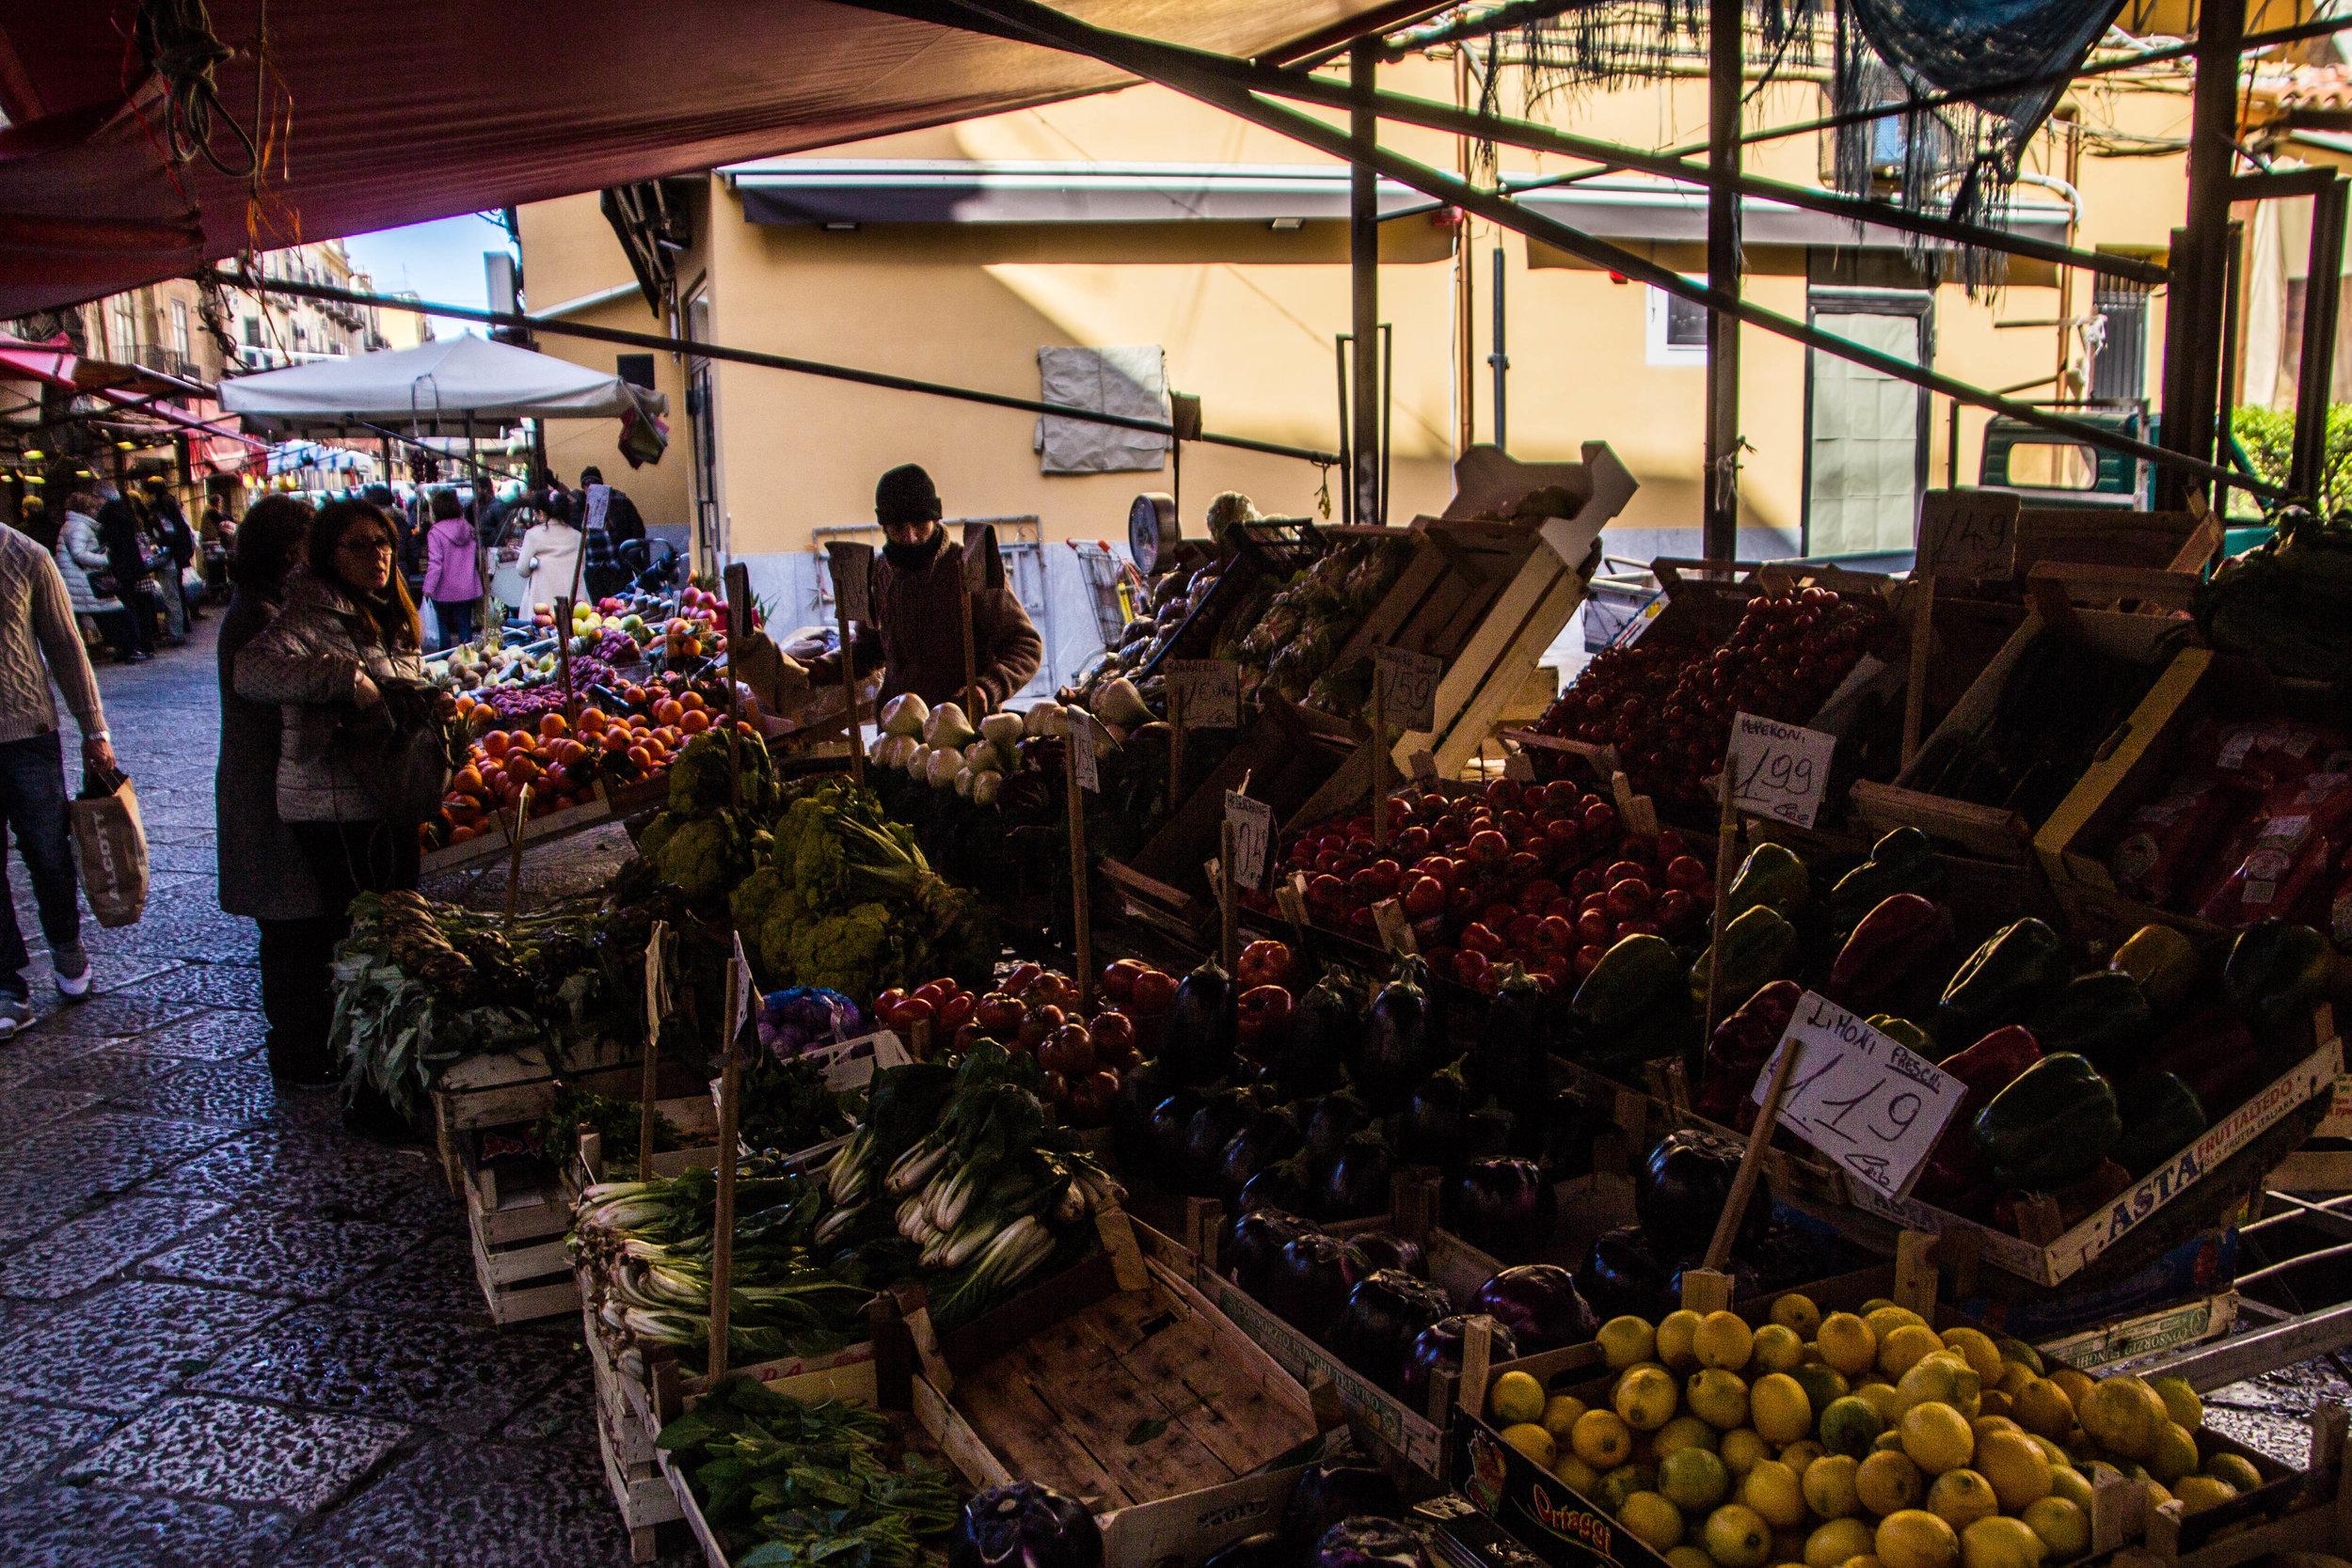 street-markets-palermo-sicily-7.jpg